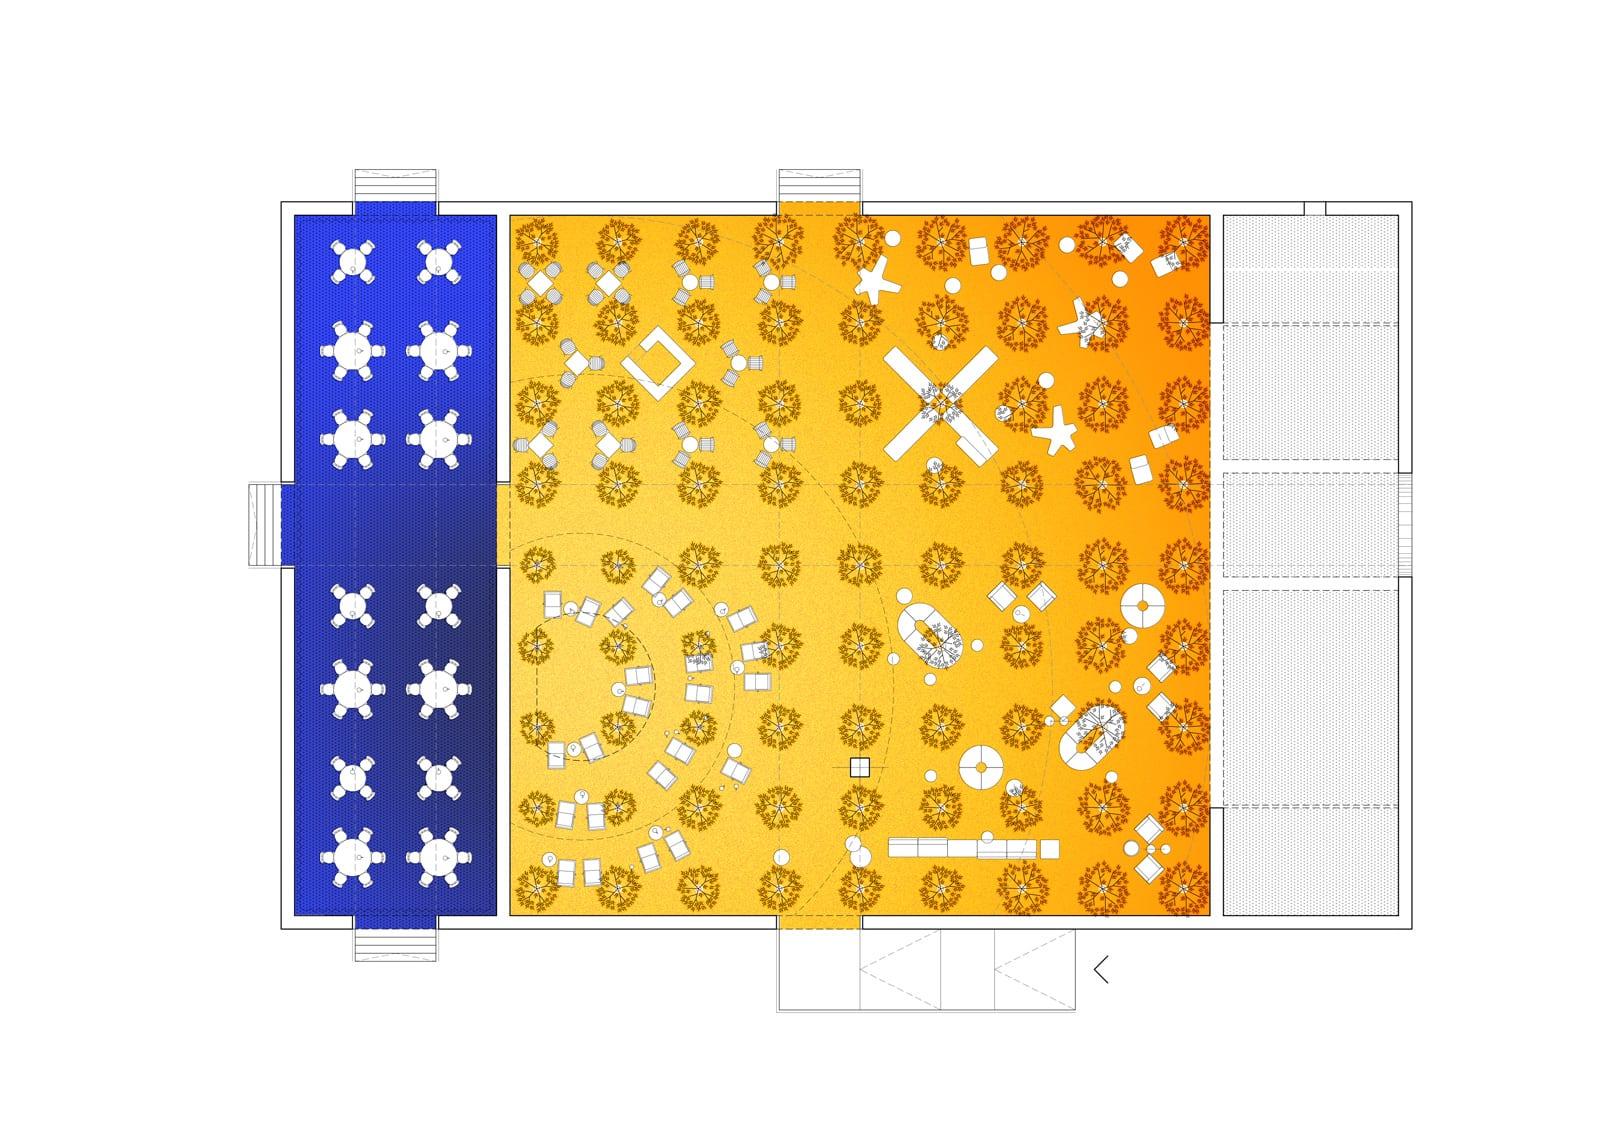 SALIDA  - 20210823 GonzaloVal ArcoVip 12 62